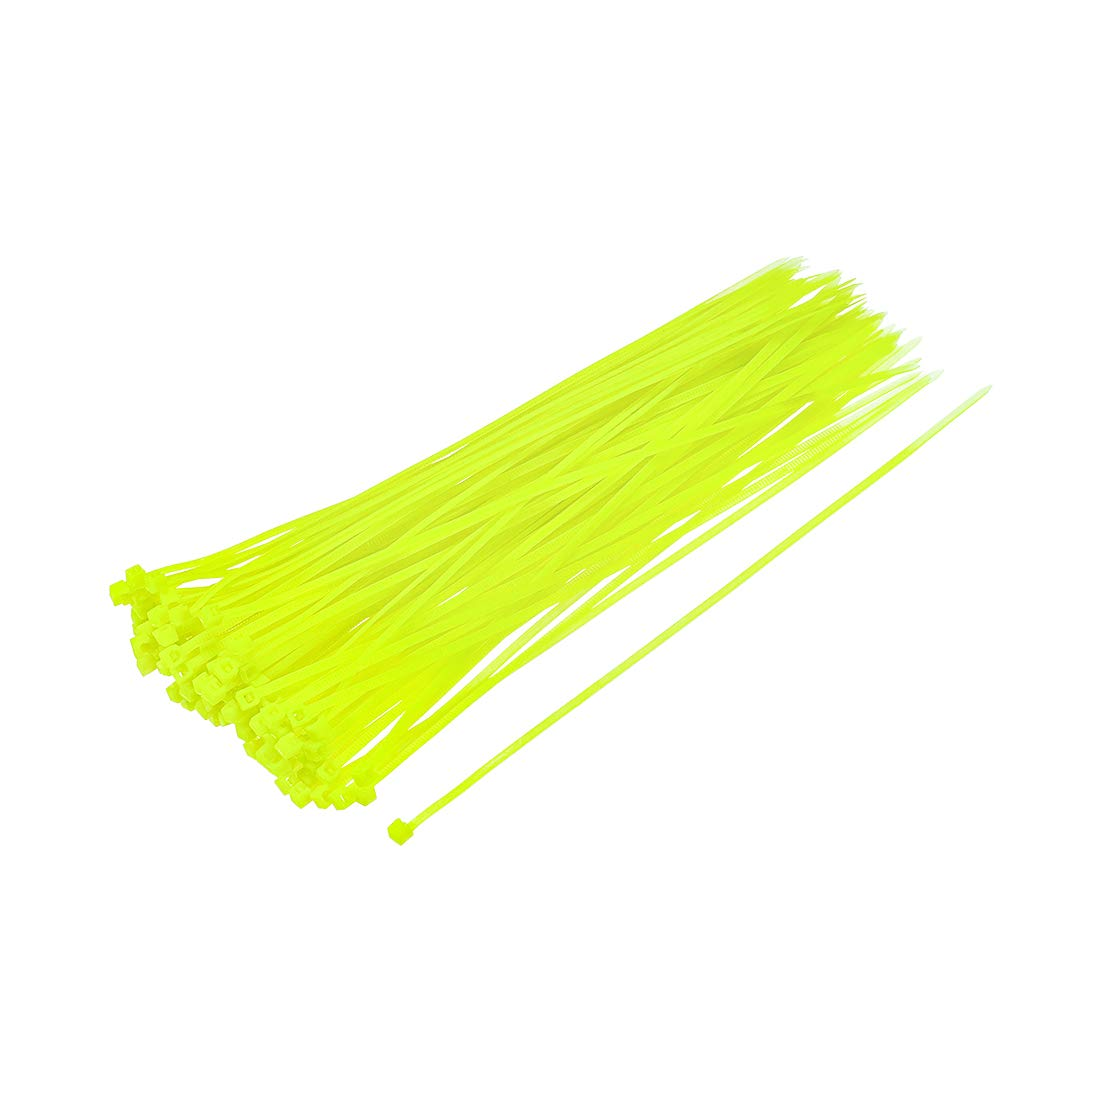 sourcing map Cavo Zip Fascette 200mmx2.5mm Autobloccante Nylon Avvolgi Fluorescente Verde 400pz